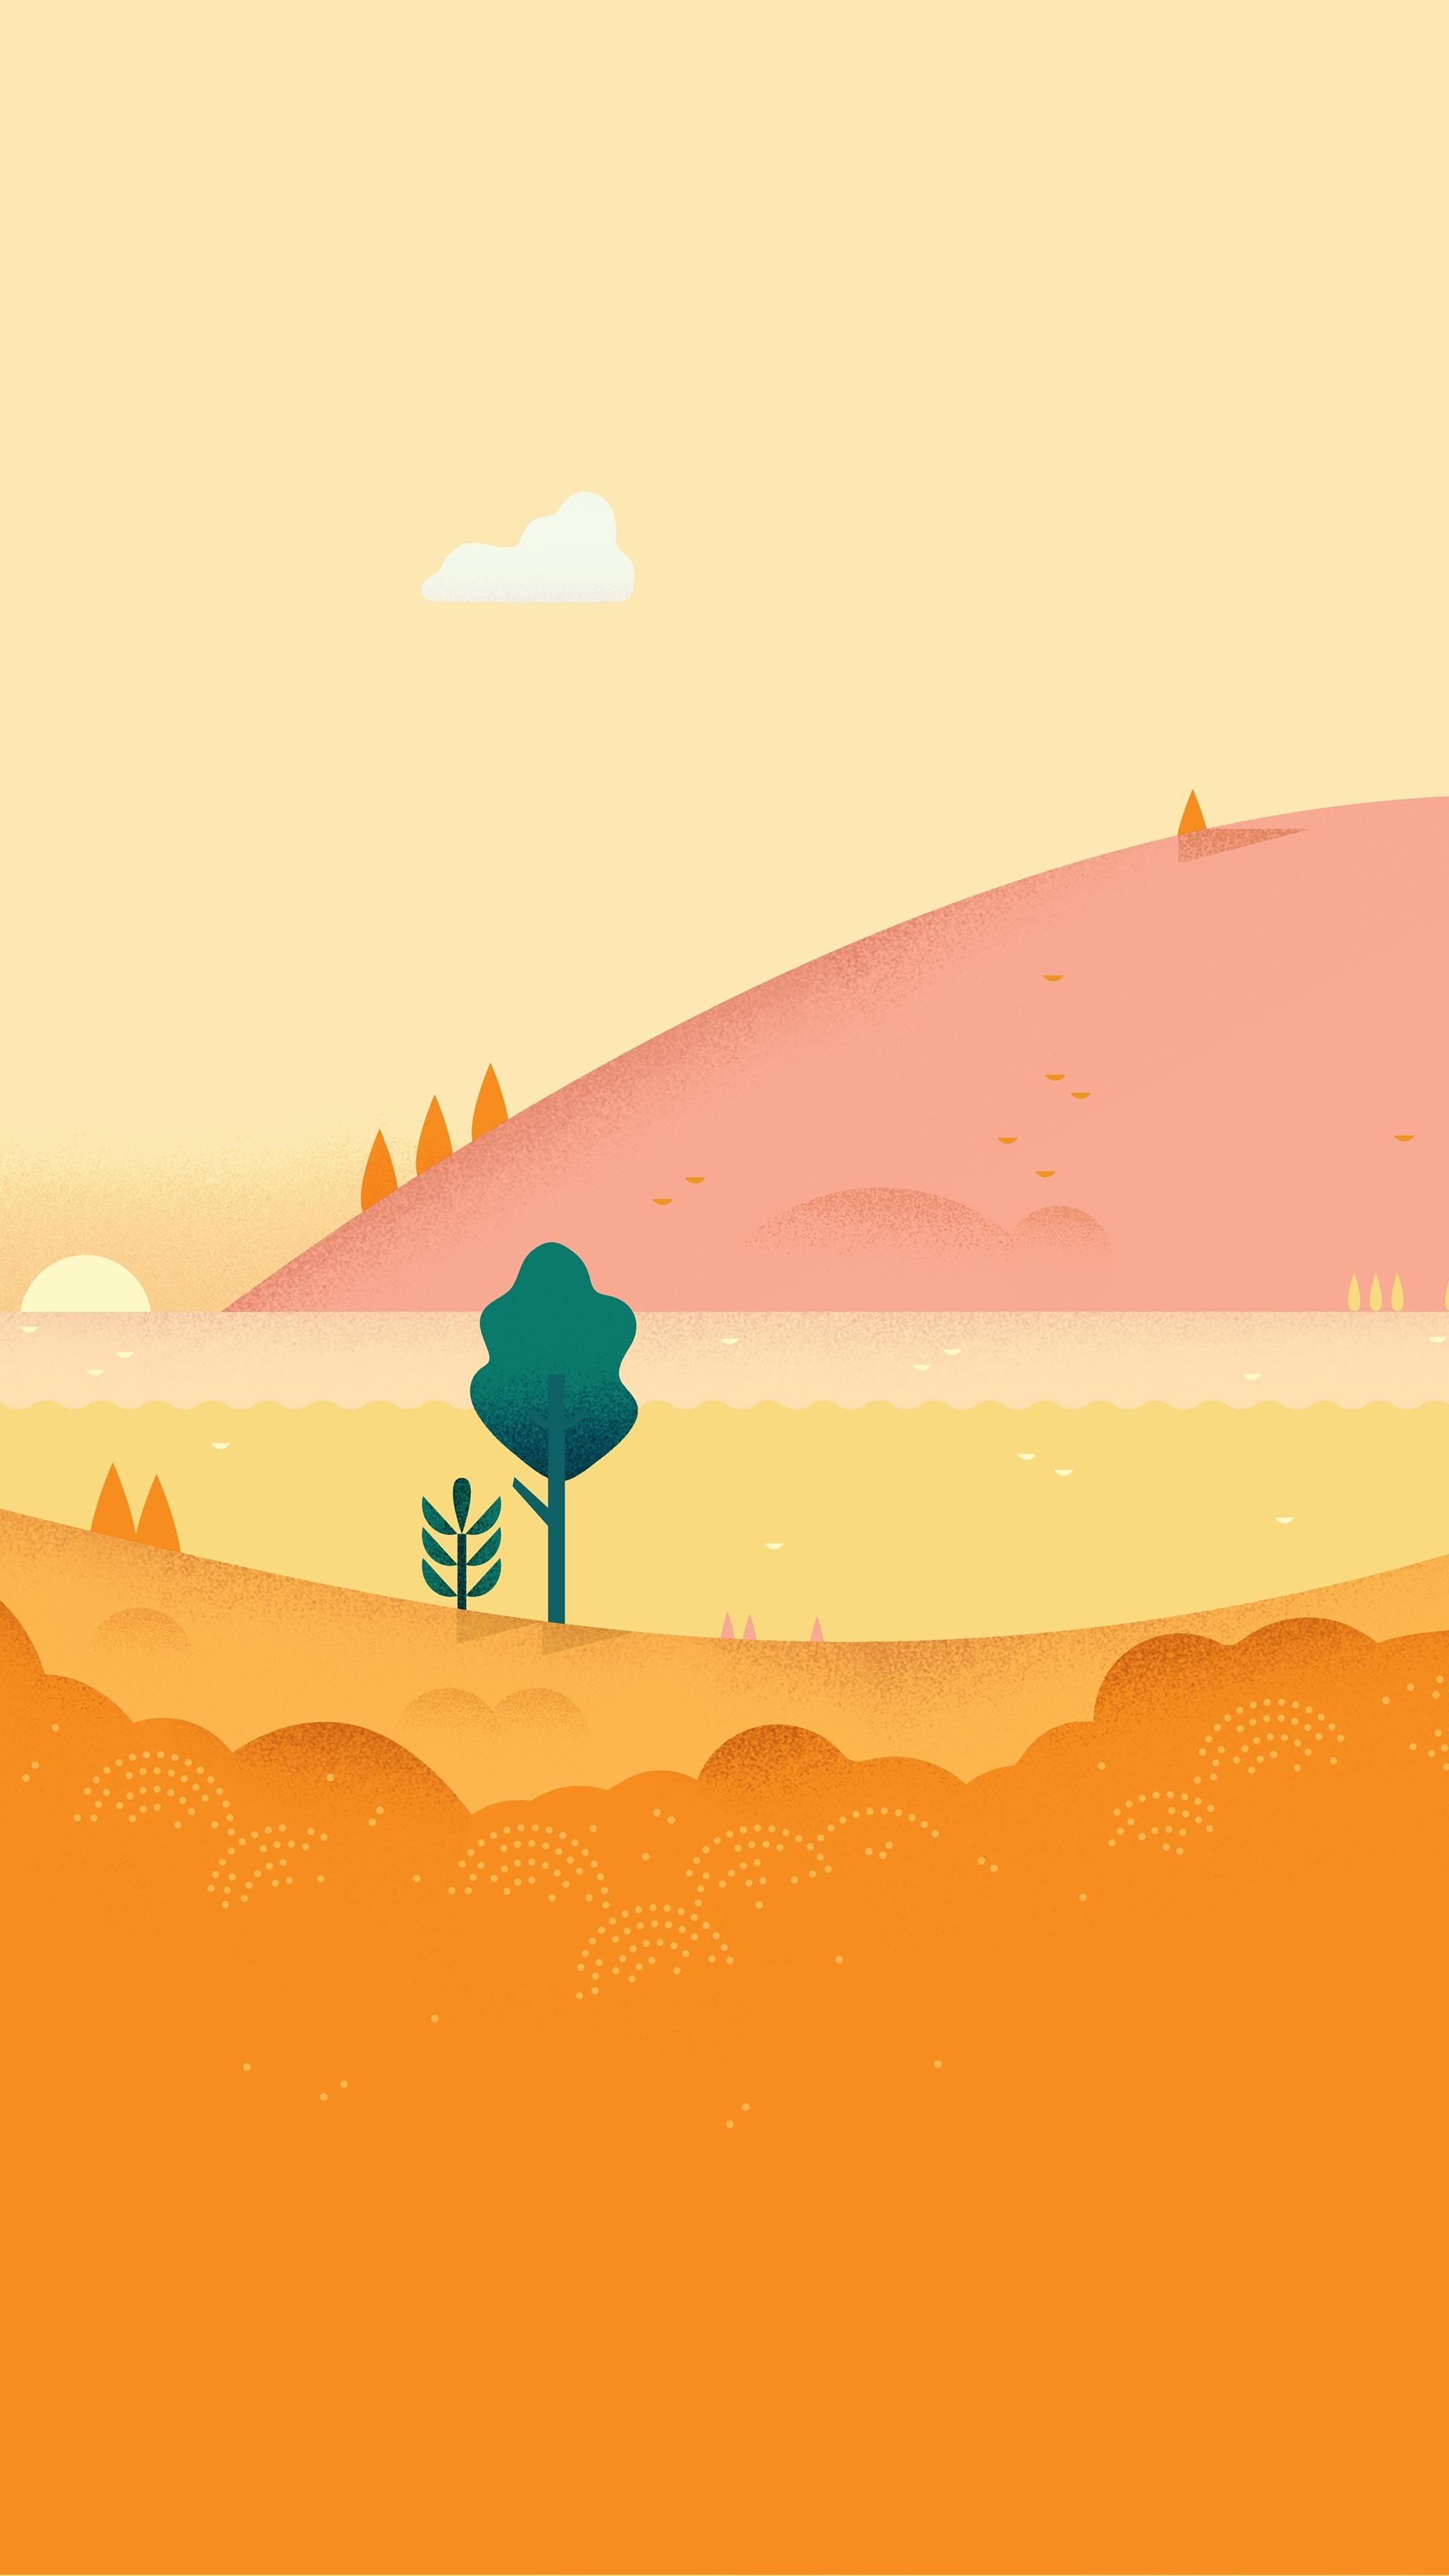 android 2160x3840 5k 4k hd wallpaper pattern landscape orange yellow 3431